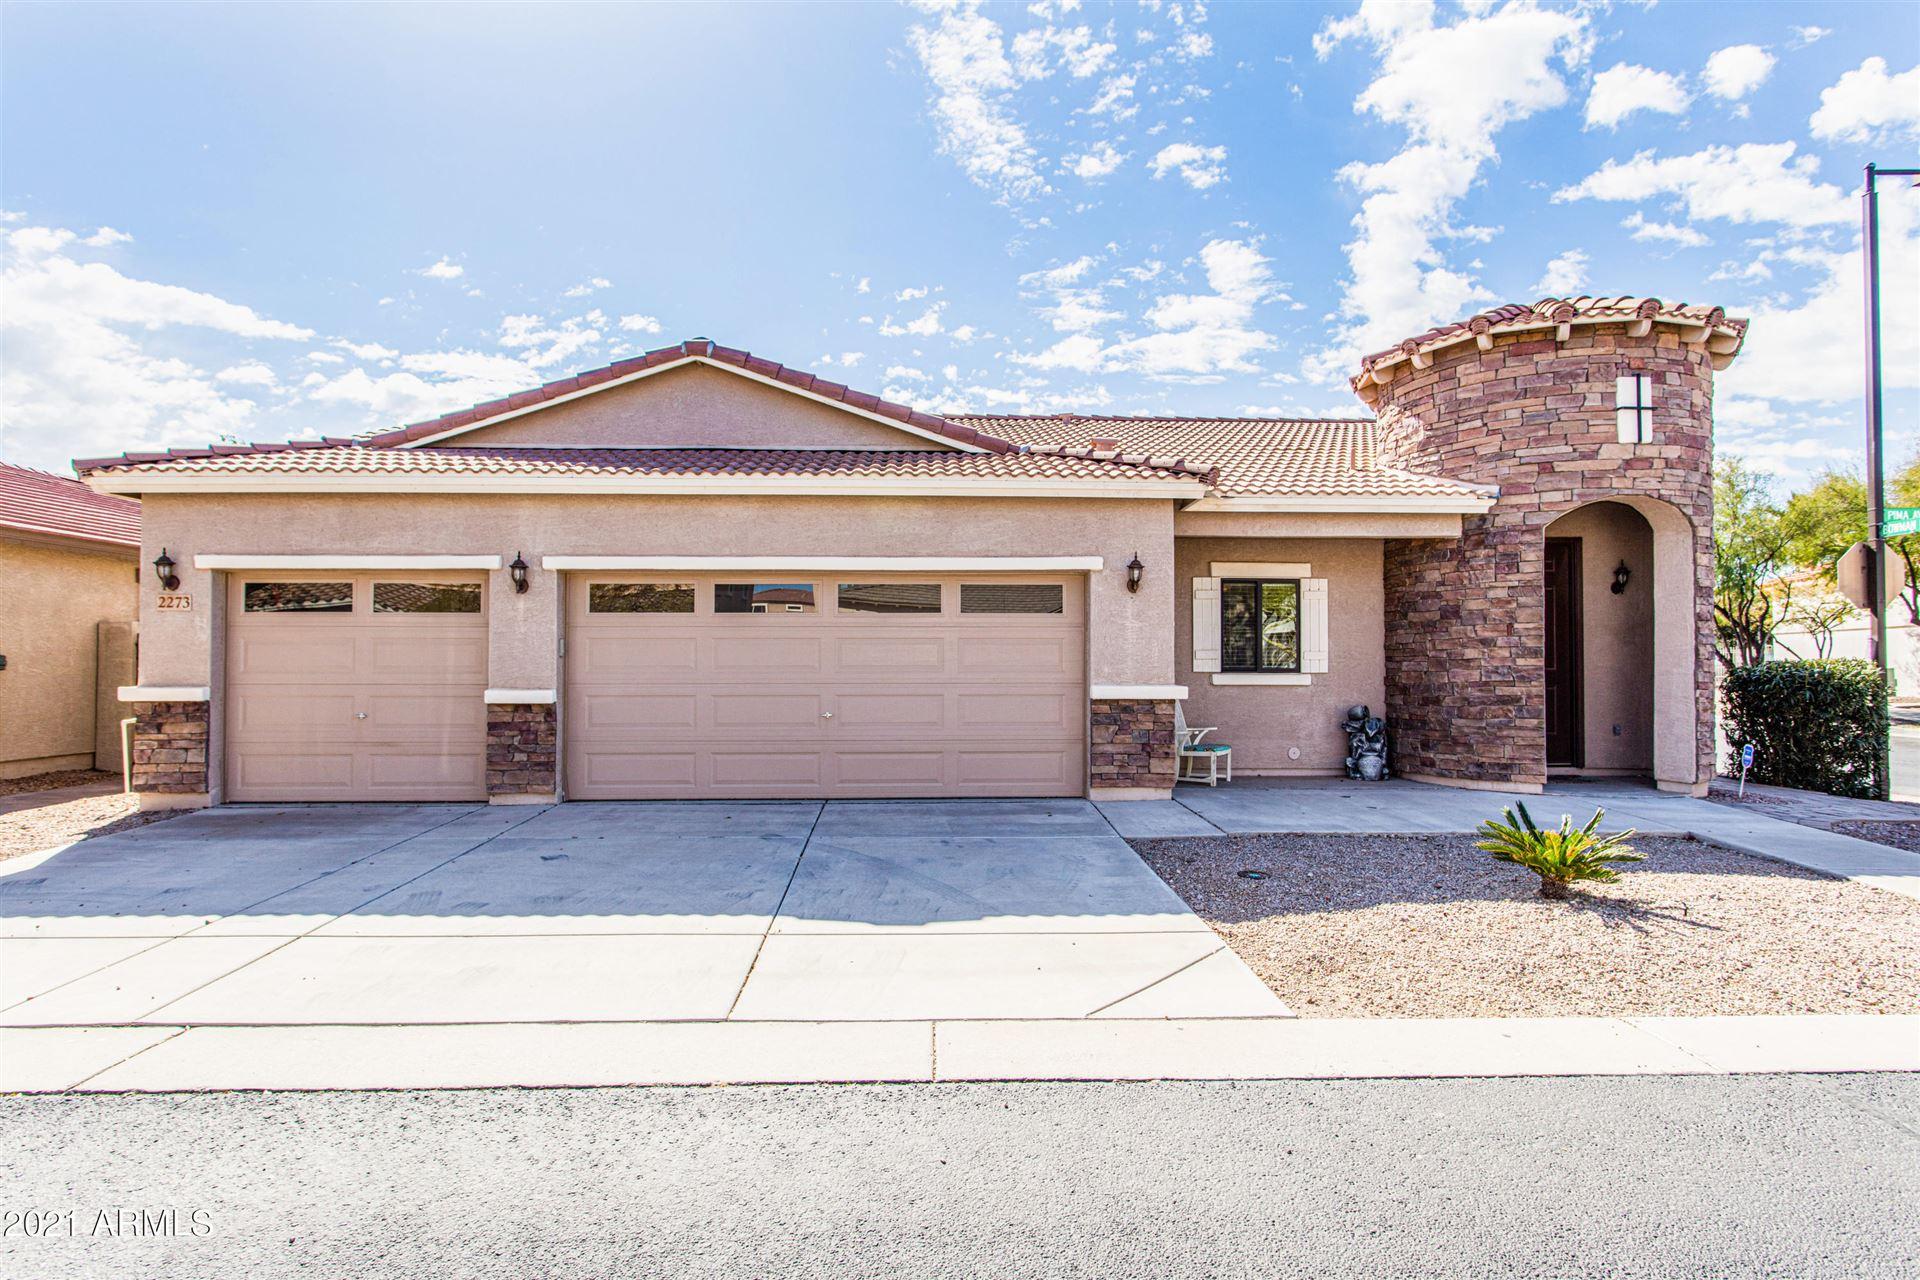 Photo of 2273 E PIMA Avenue, Apache Junction, AZ 85119 (MLS # 6200680)